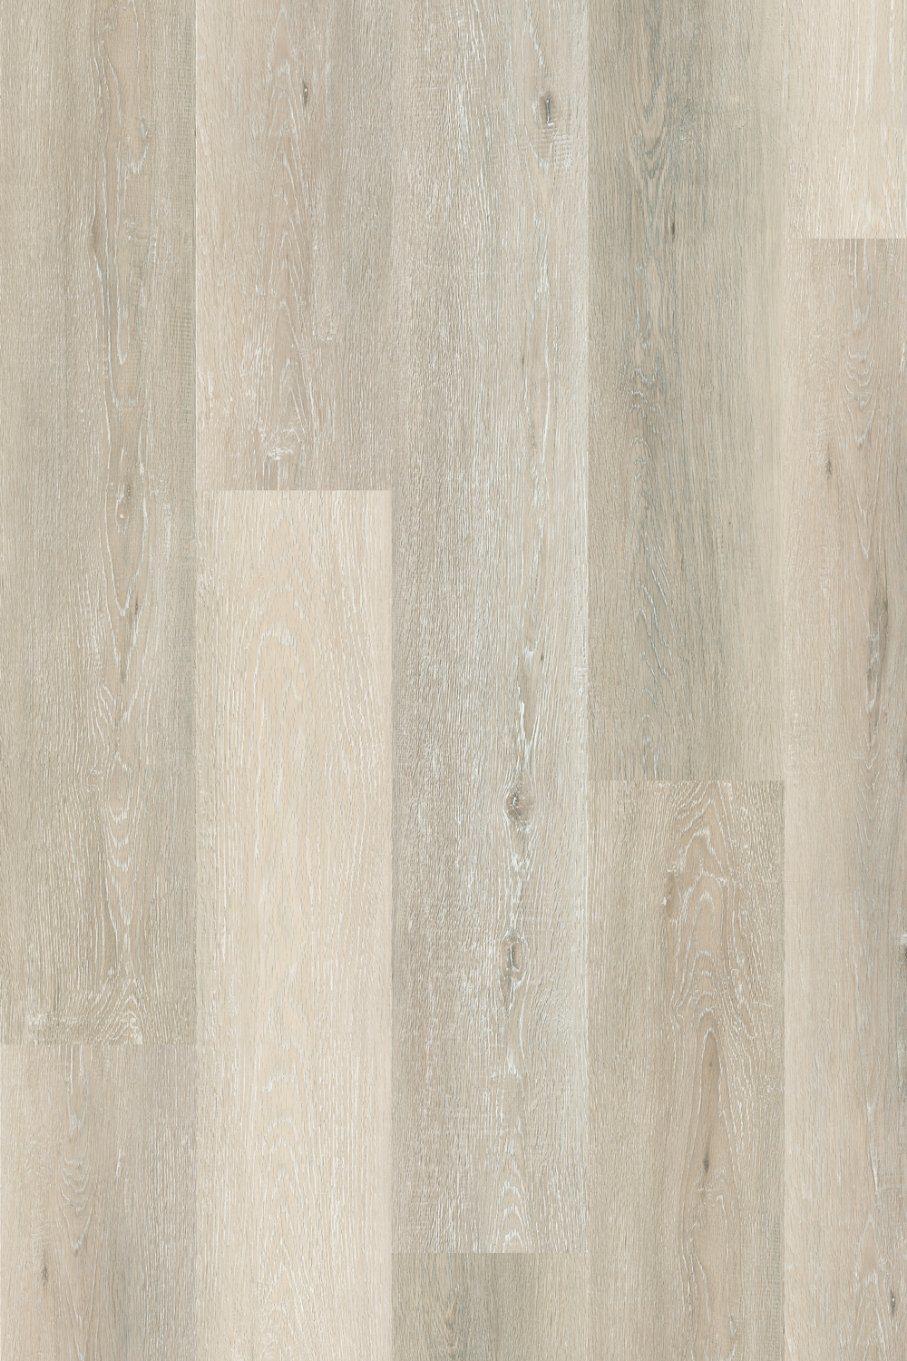 China 4mm New Oak Laminate Kitchen Sheet Vinyl Plank Luxury PVC